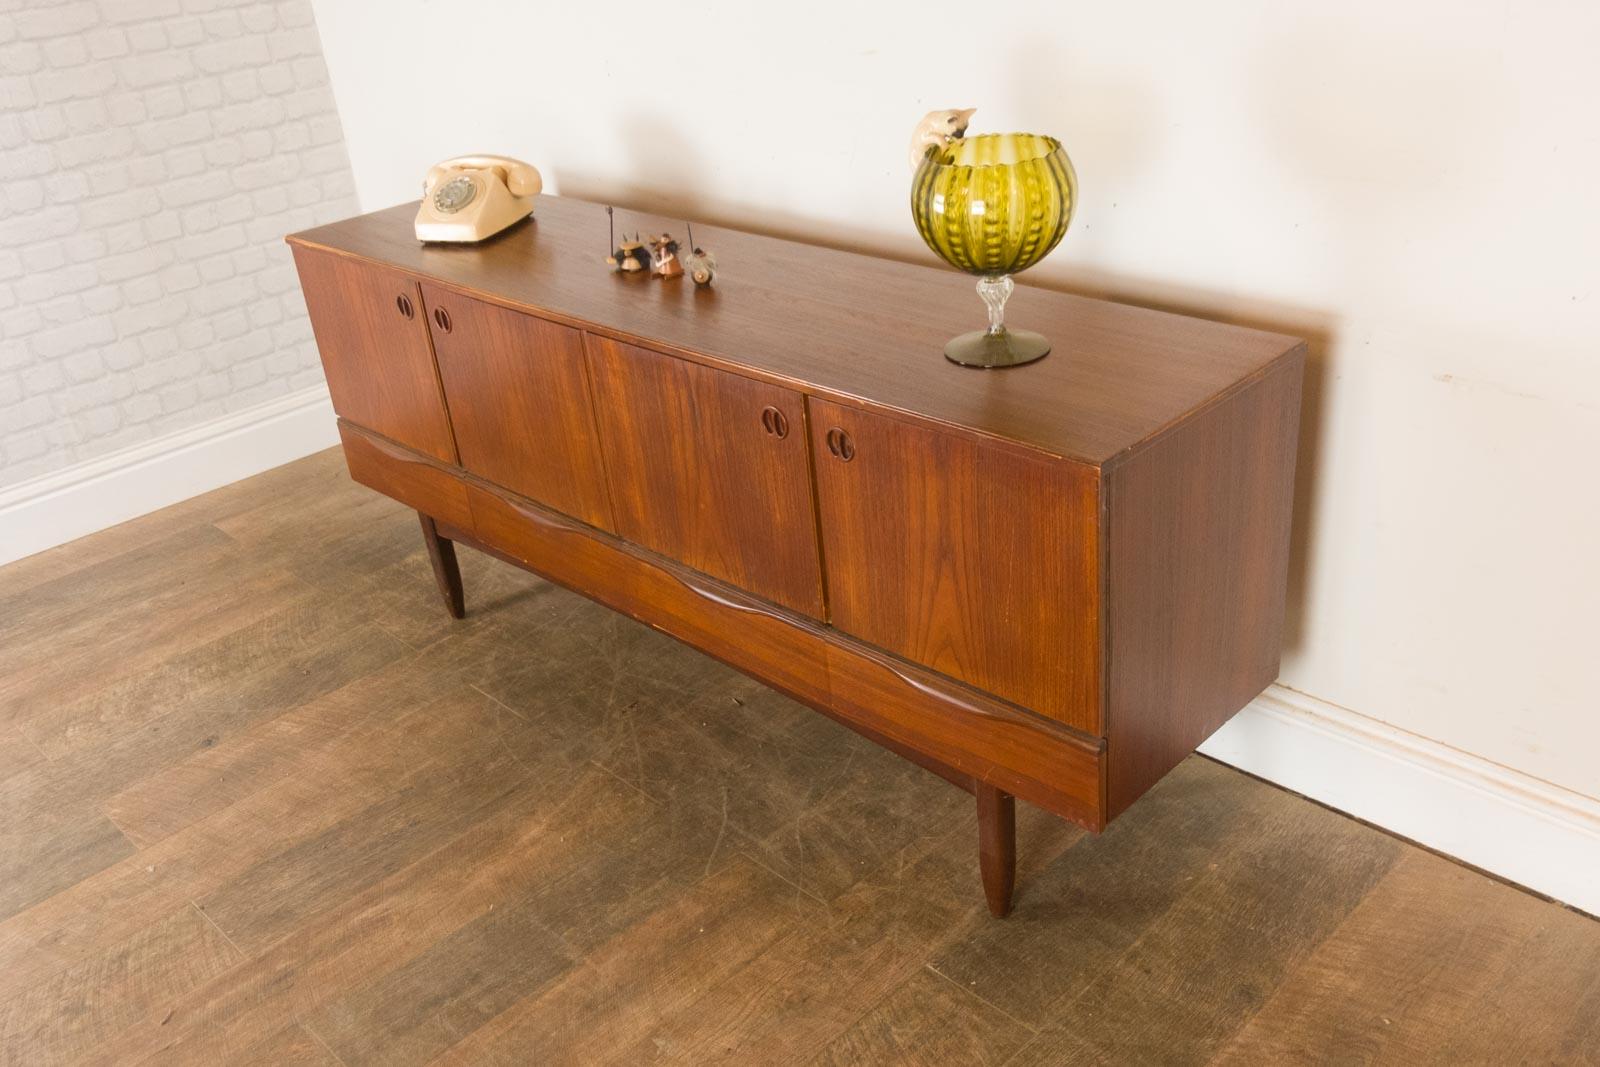 Vintage Retro Teak Mid Century Sideboard by Portwood eBay